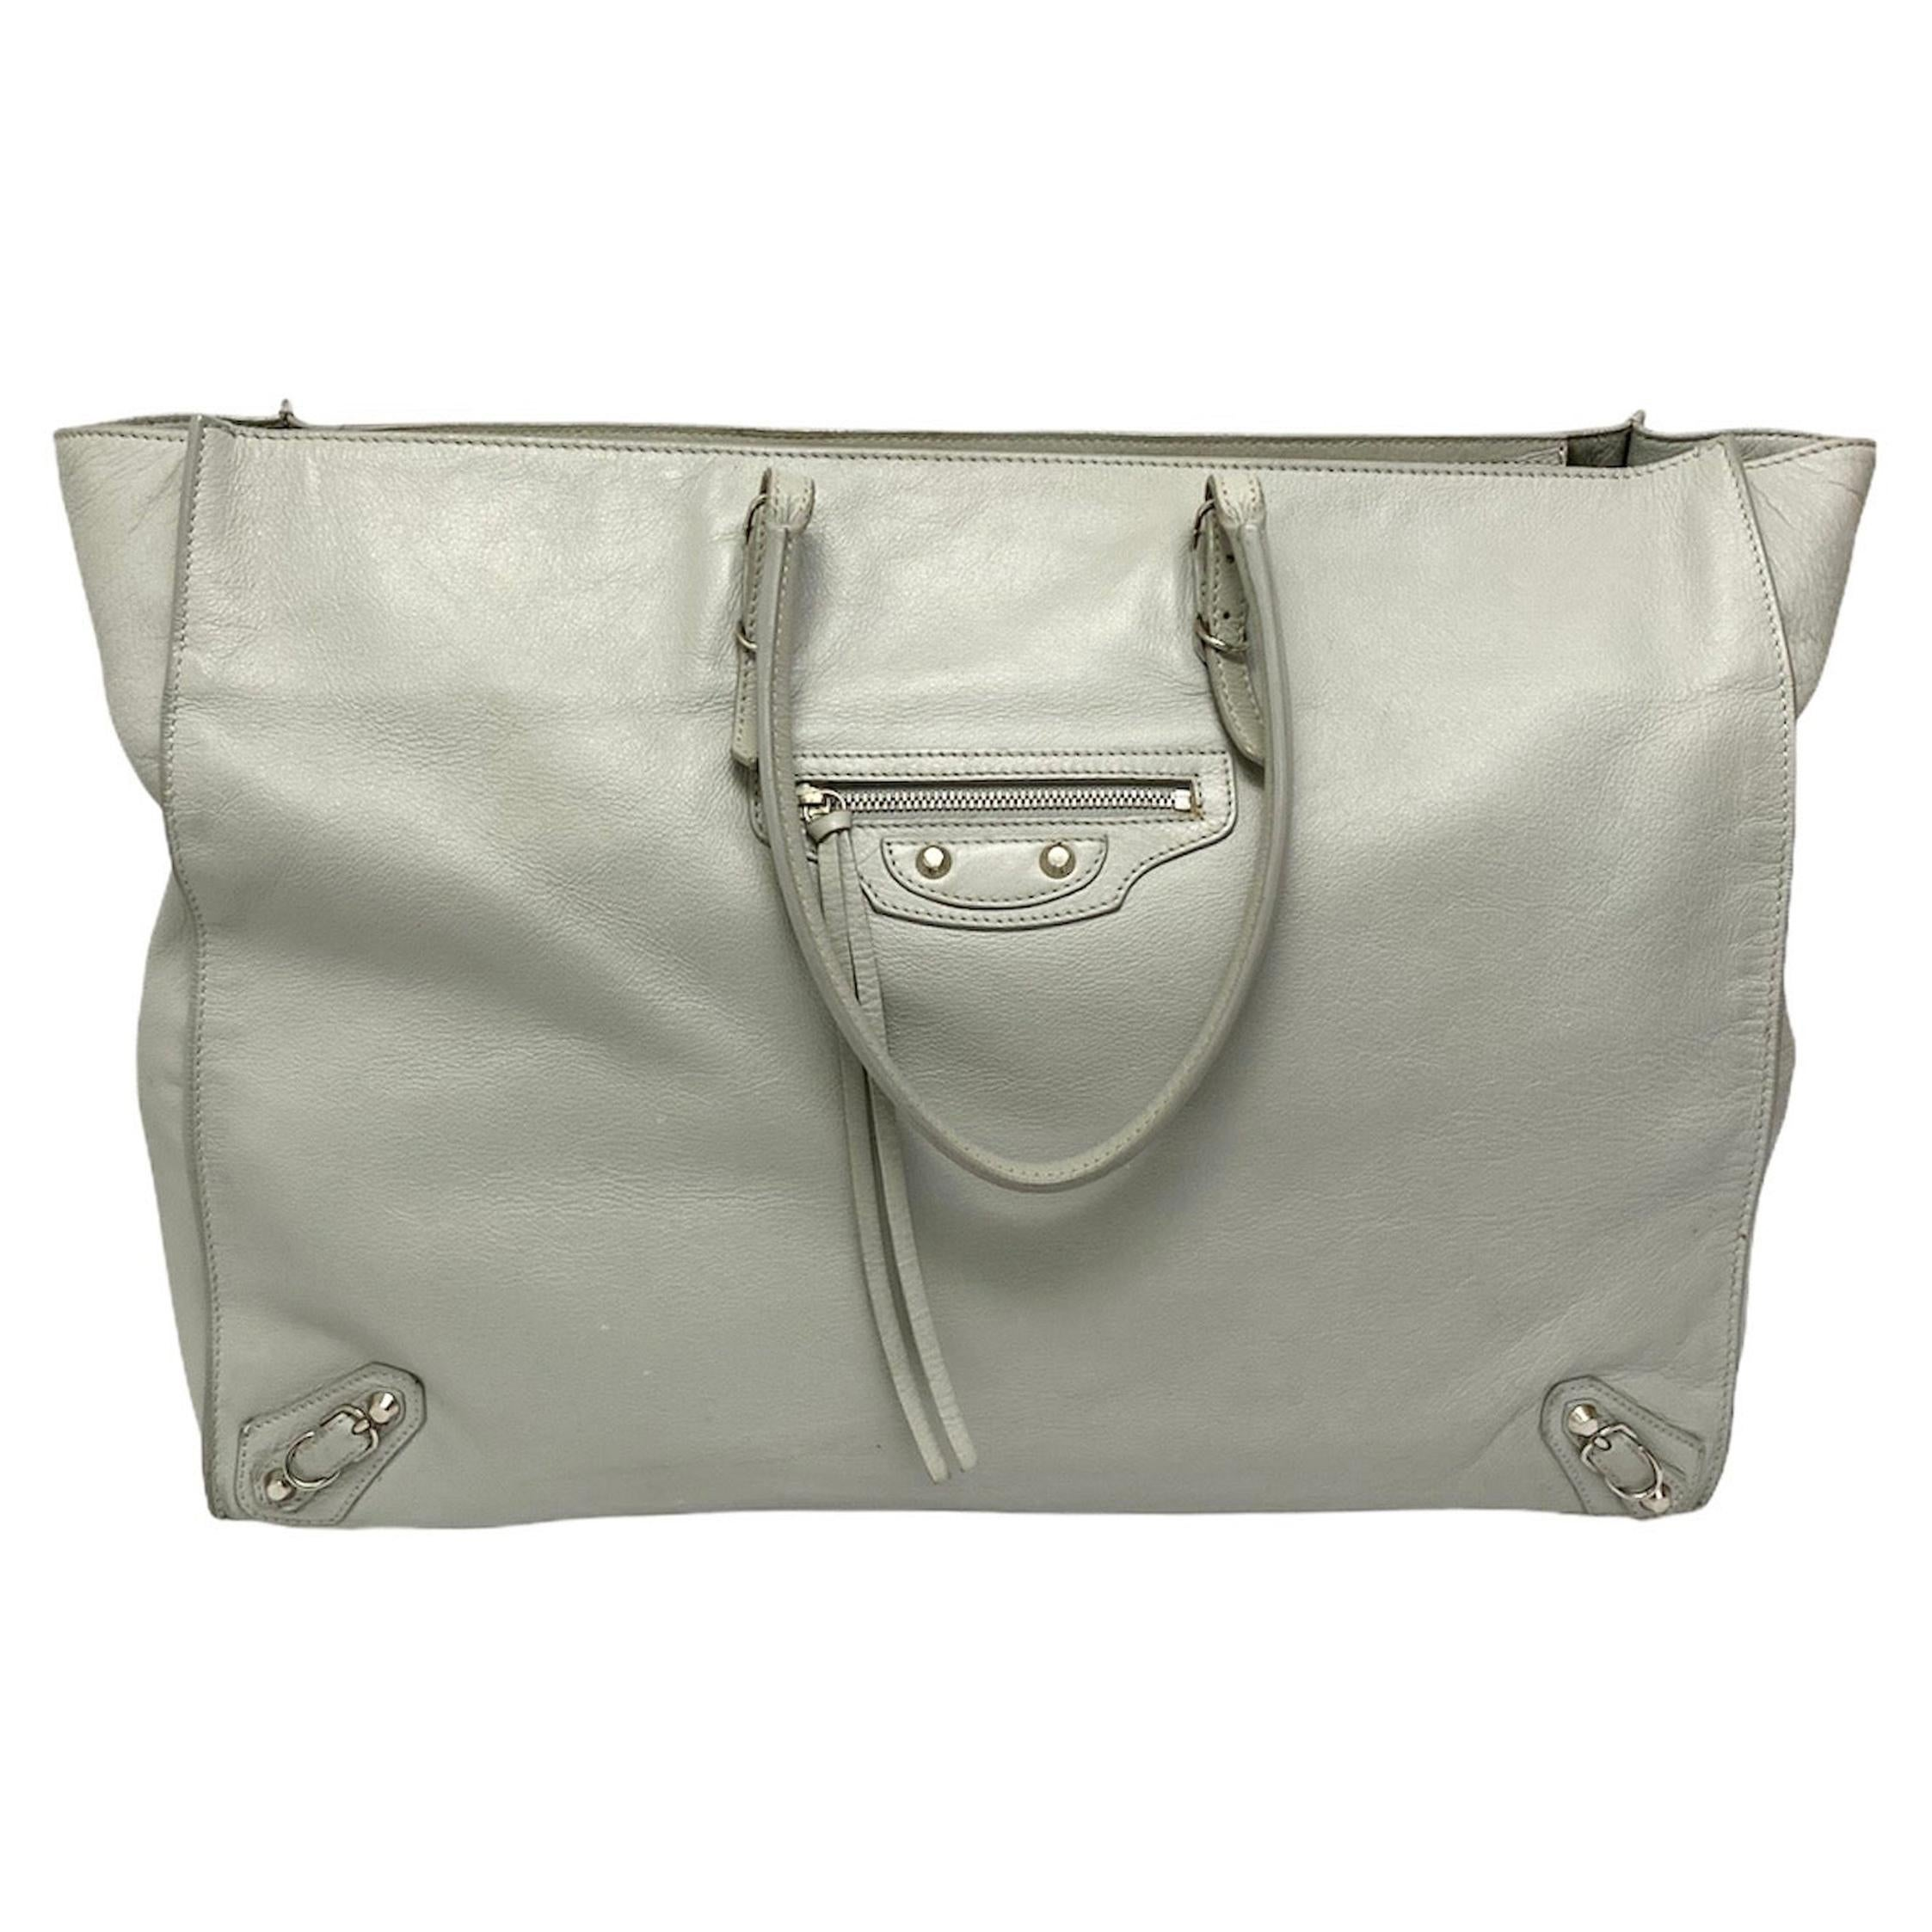 Balenciaga White Leather Papier Bag